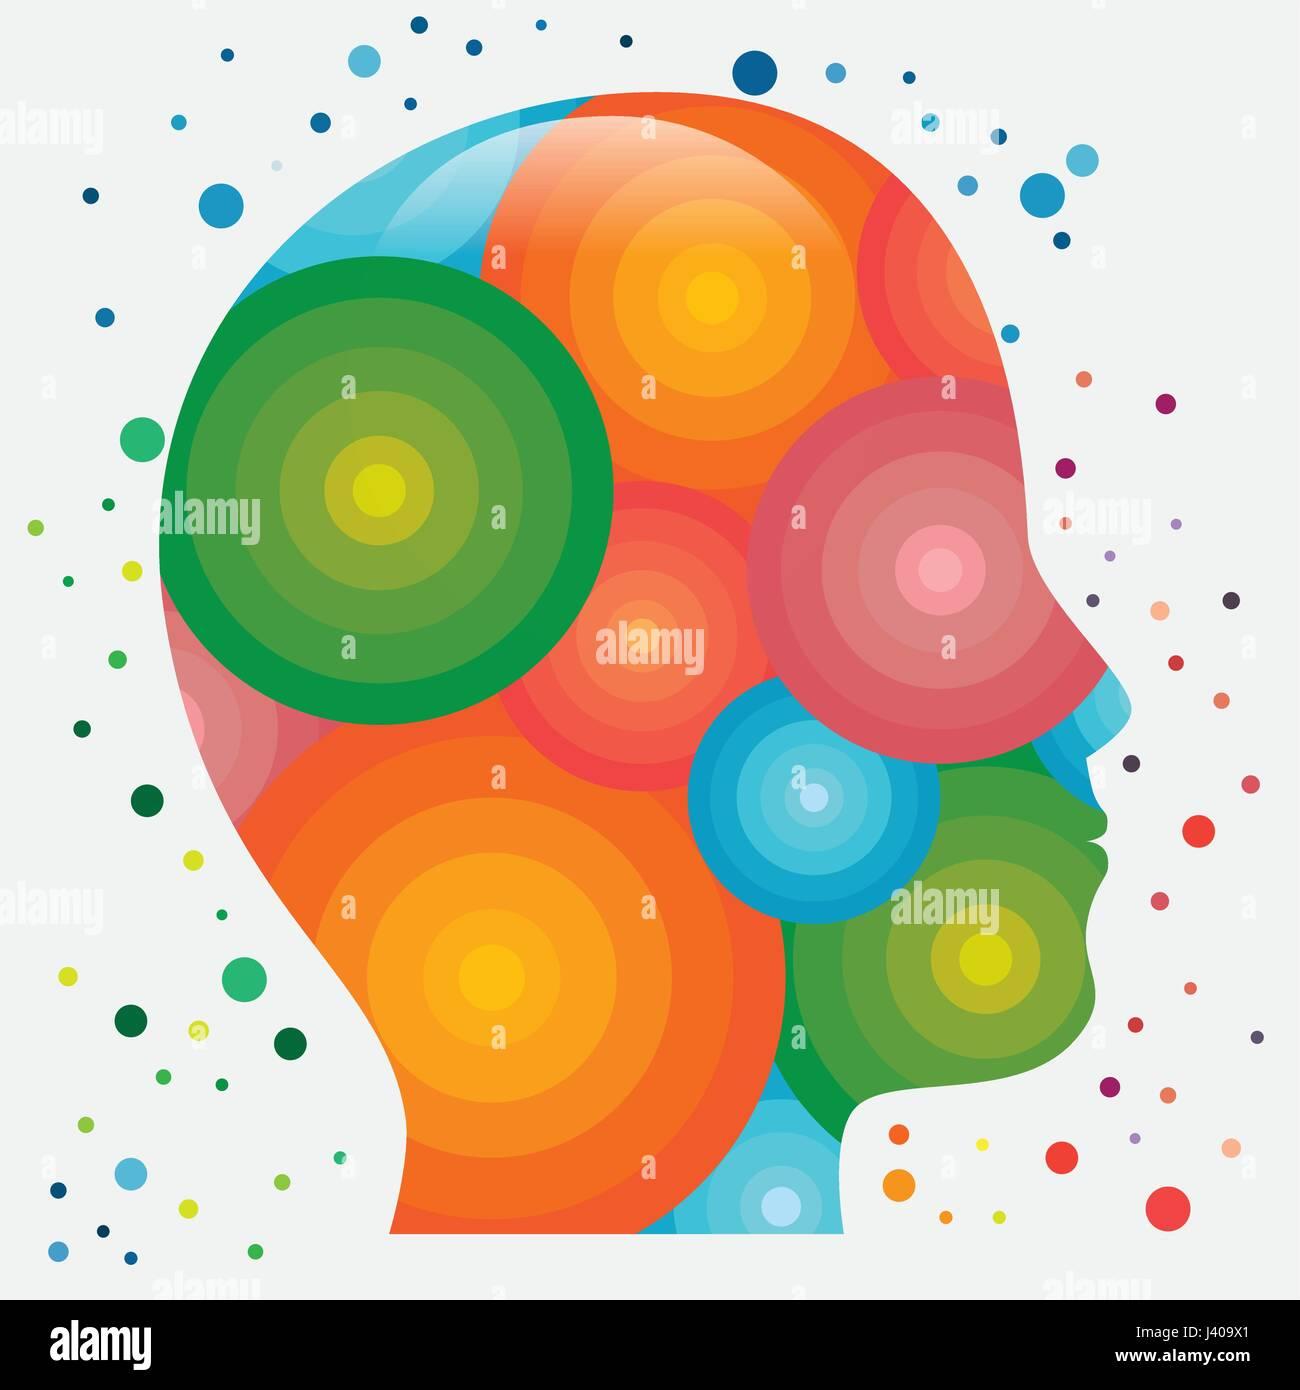 Colorido icono cabeza humana Imagen De Stock